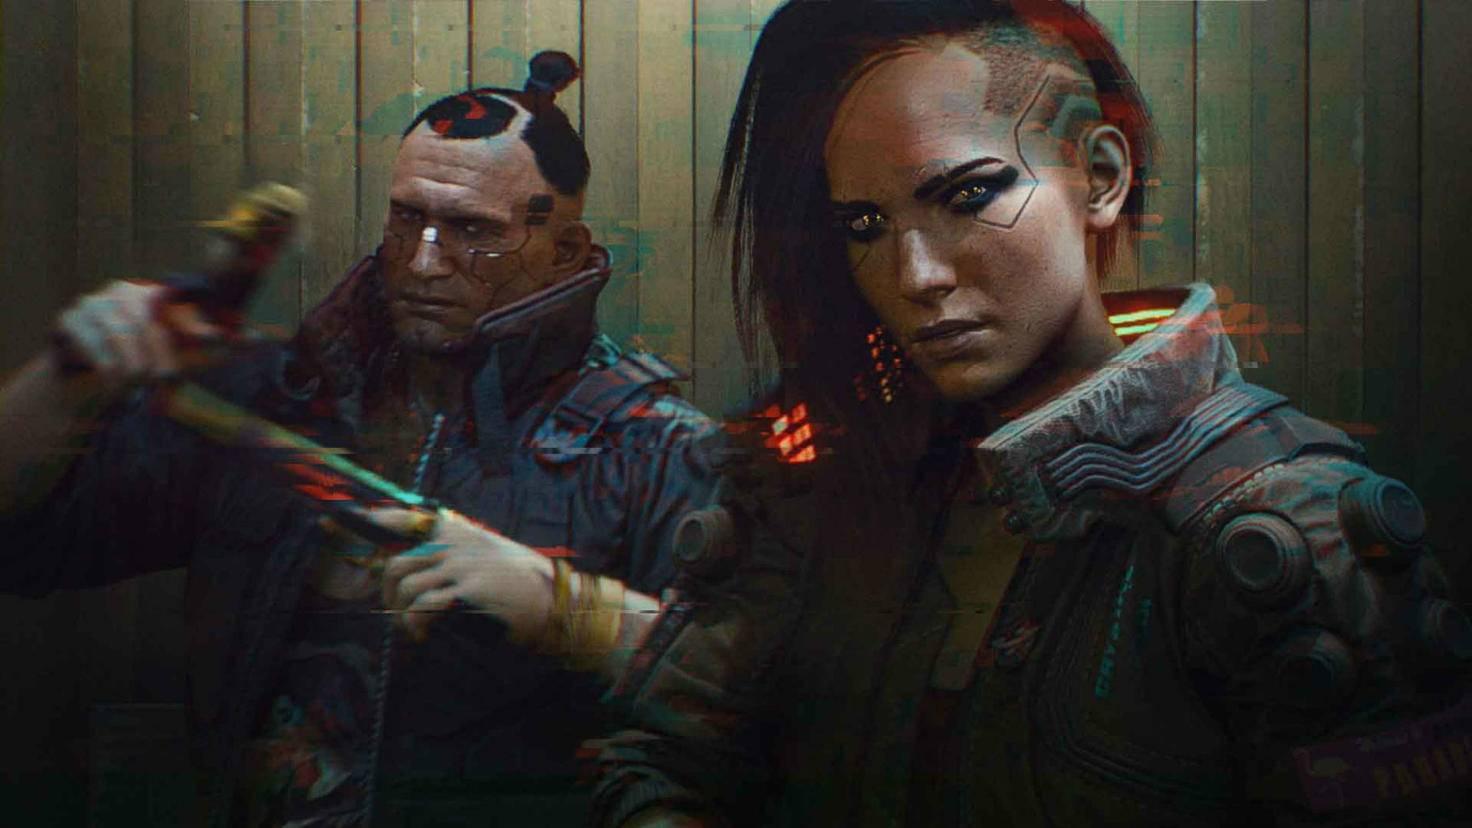 cyberpunk-2077-gameplay-reveal-artwork